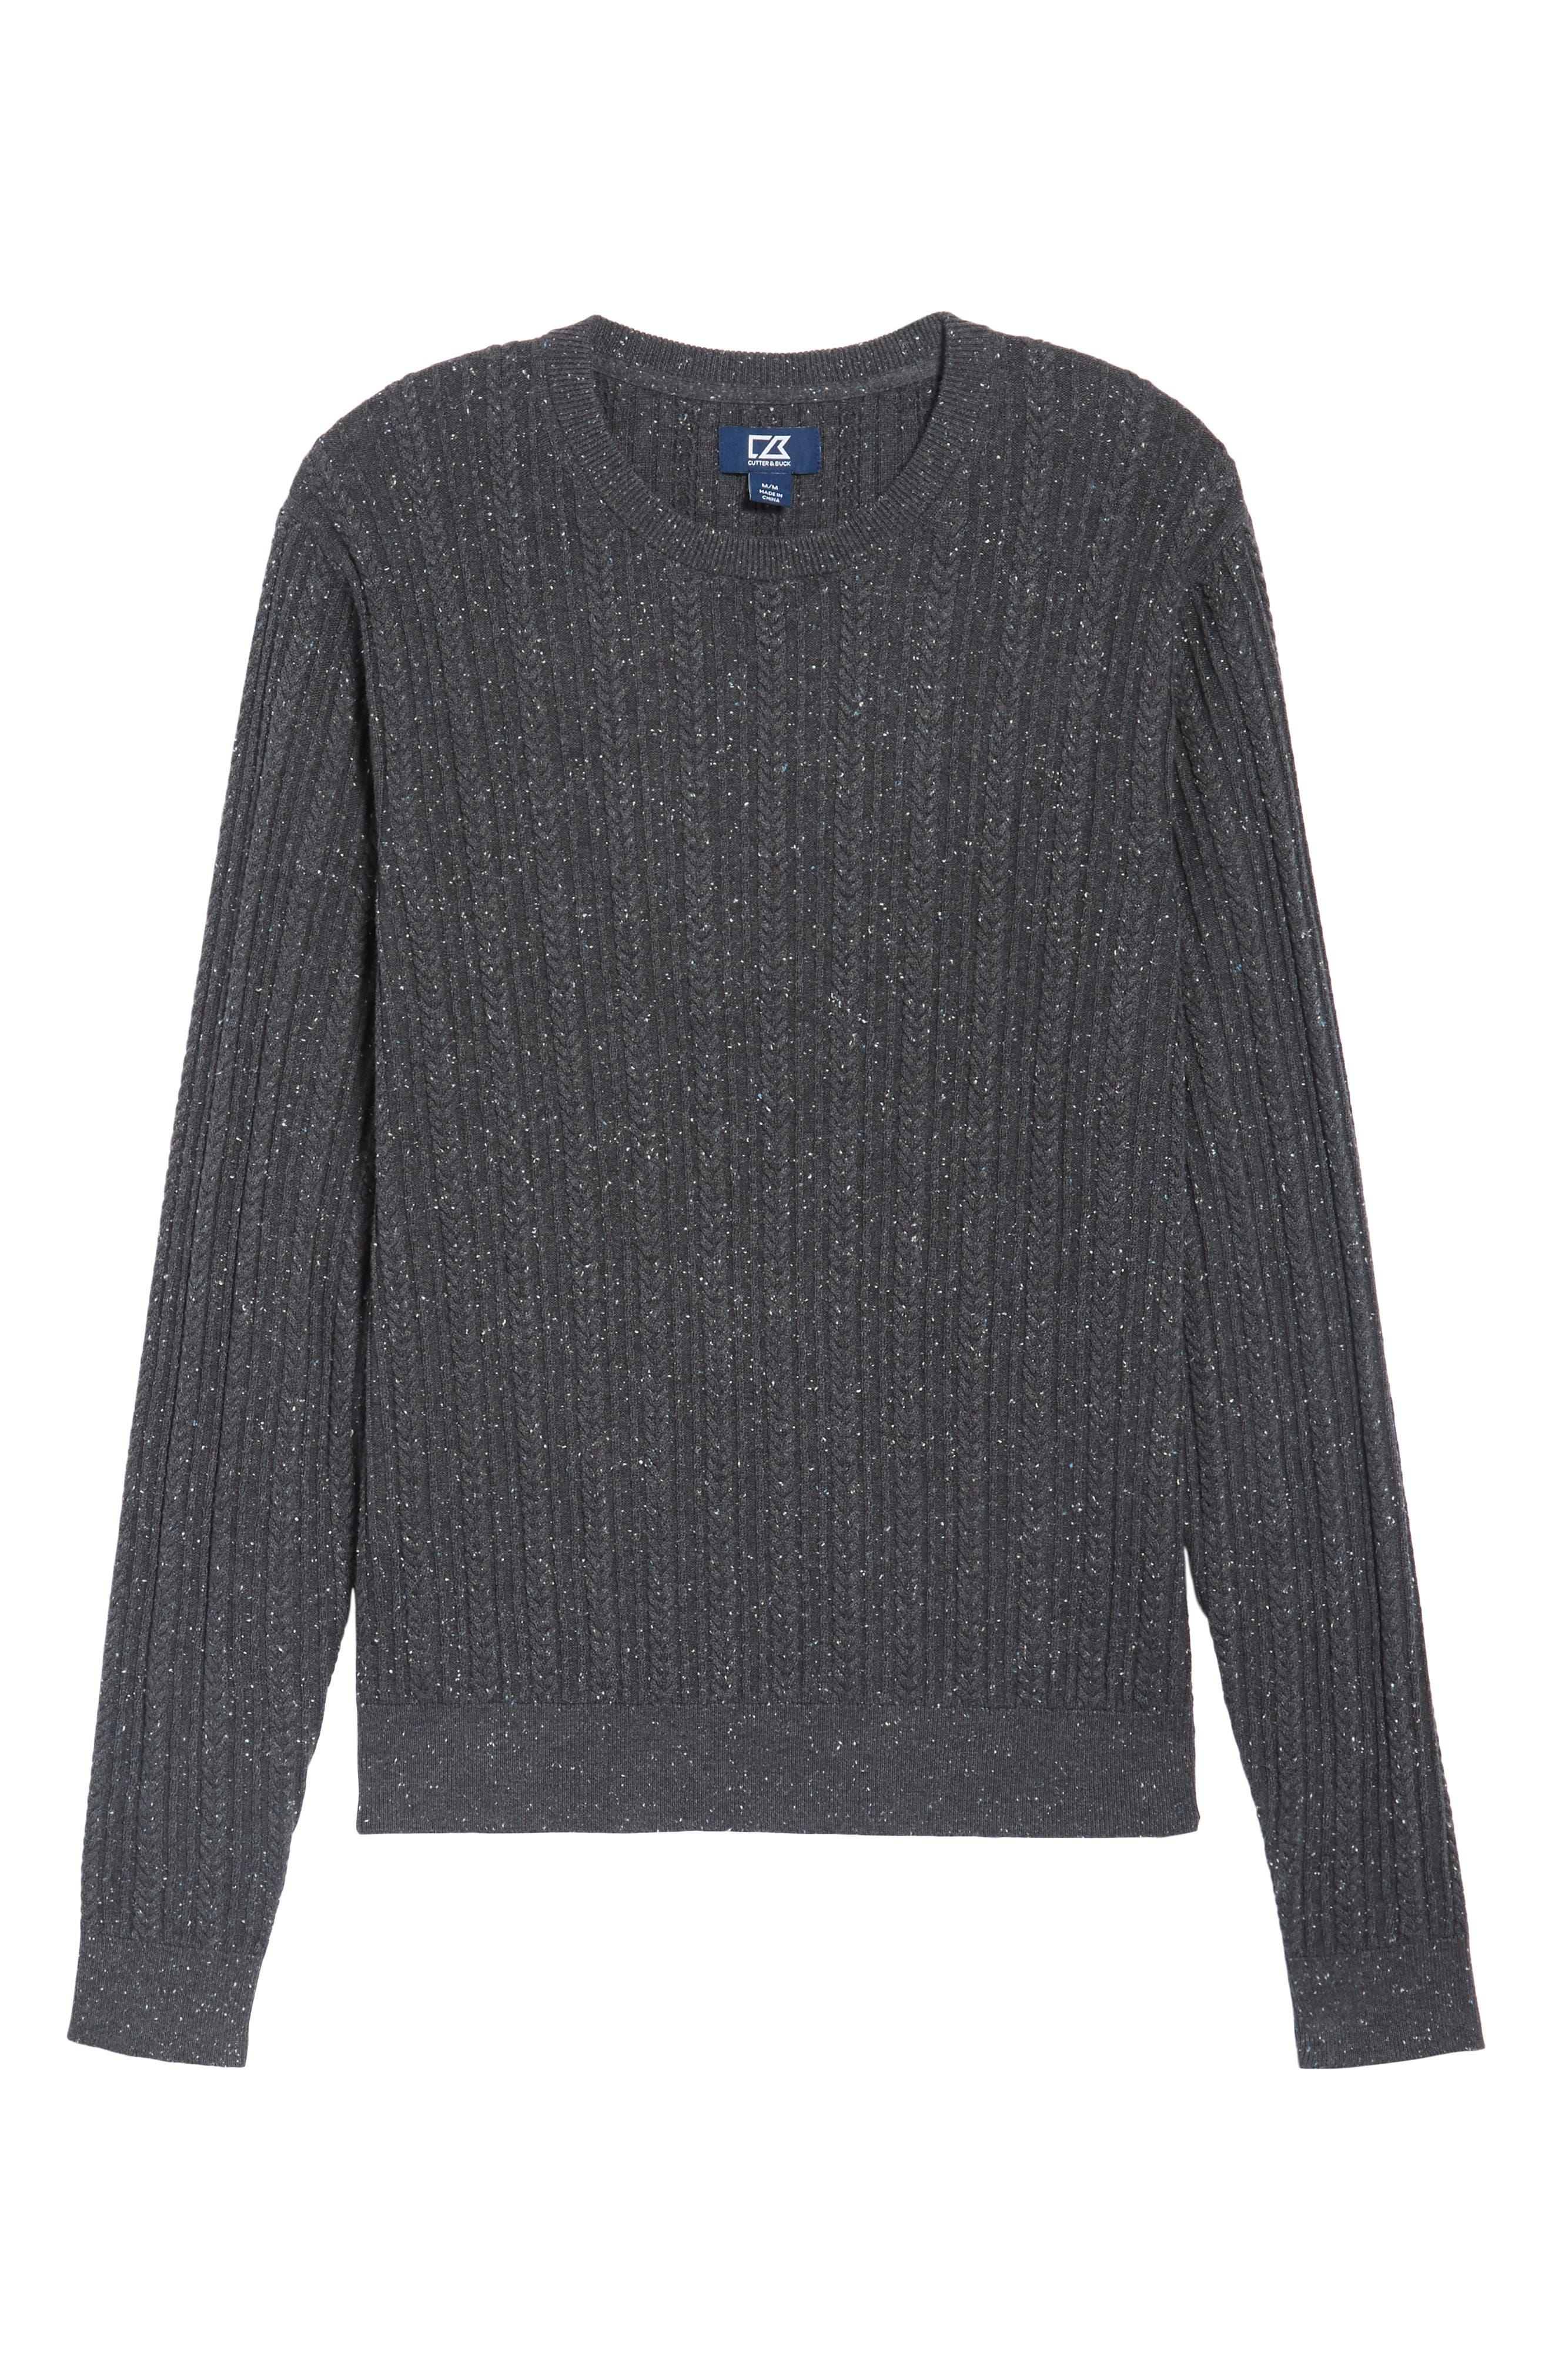 Carlton Crewneck Sweater,                             Alternate thumbnail 6, color,                             Charcoal